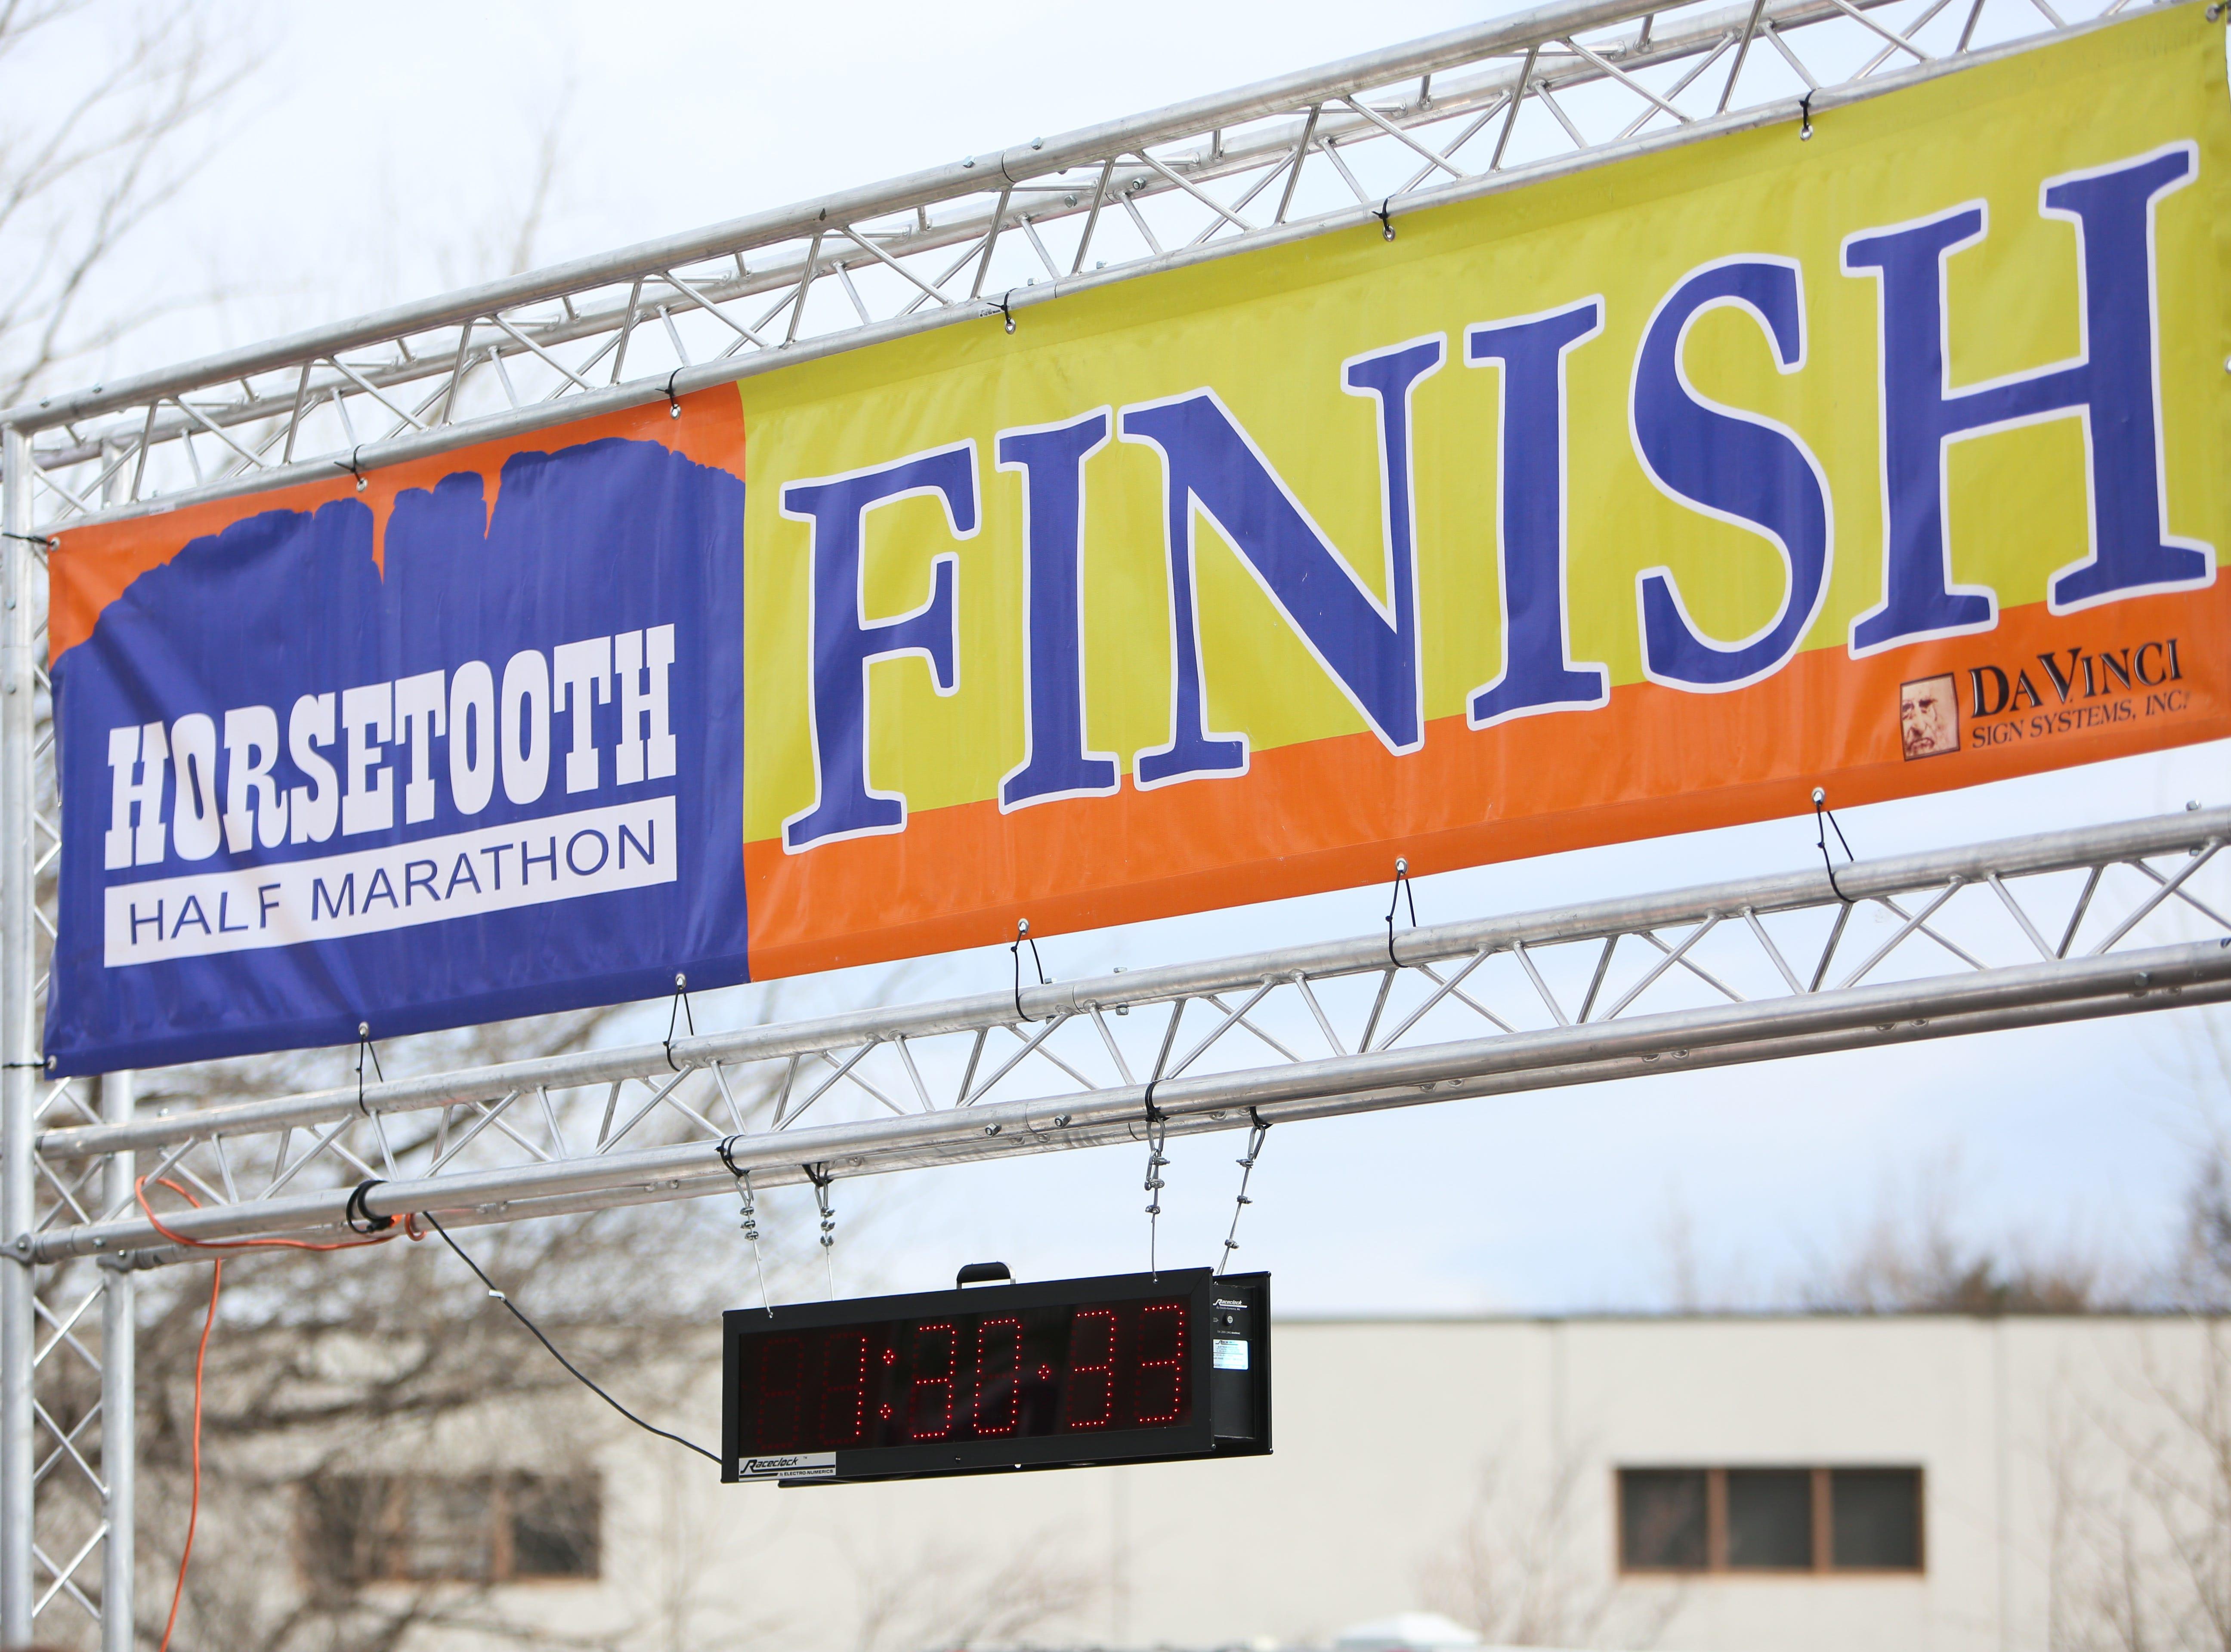 The finish line at the Horsetooth Half Marathon seen outside New Belgium.